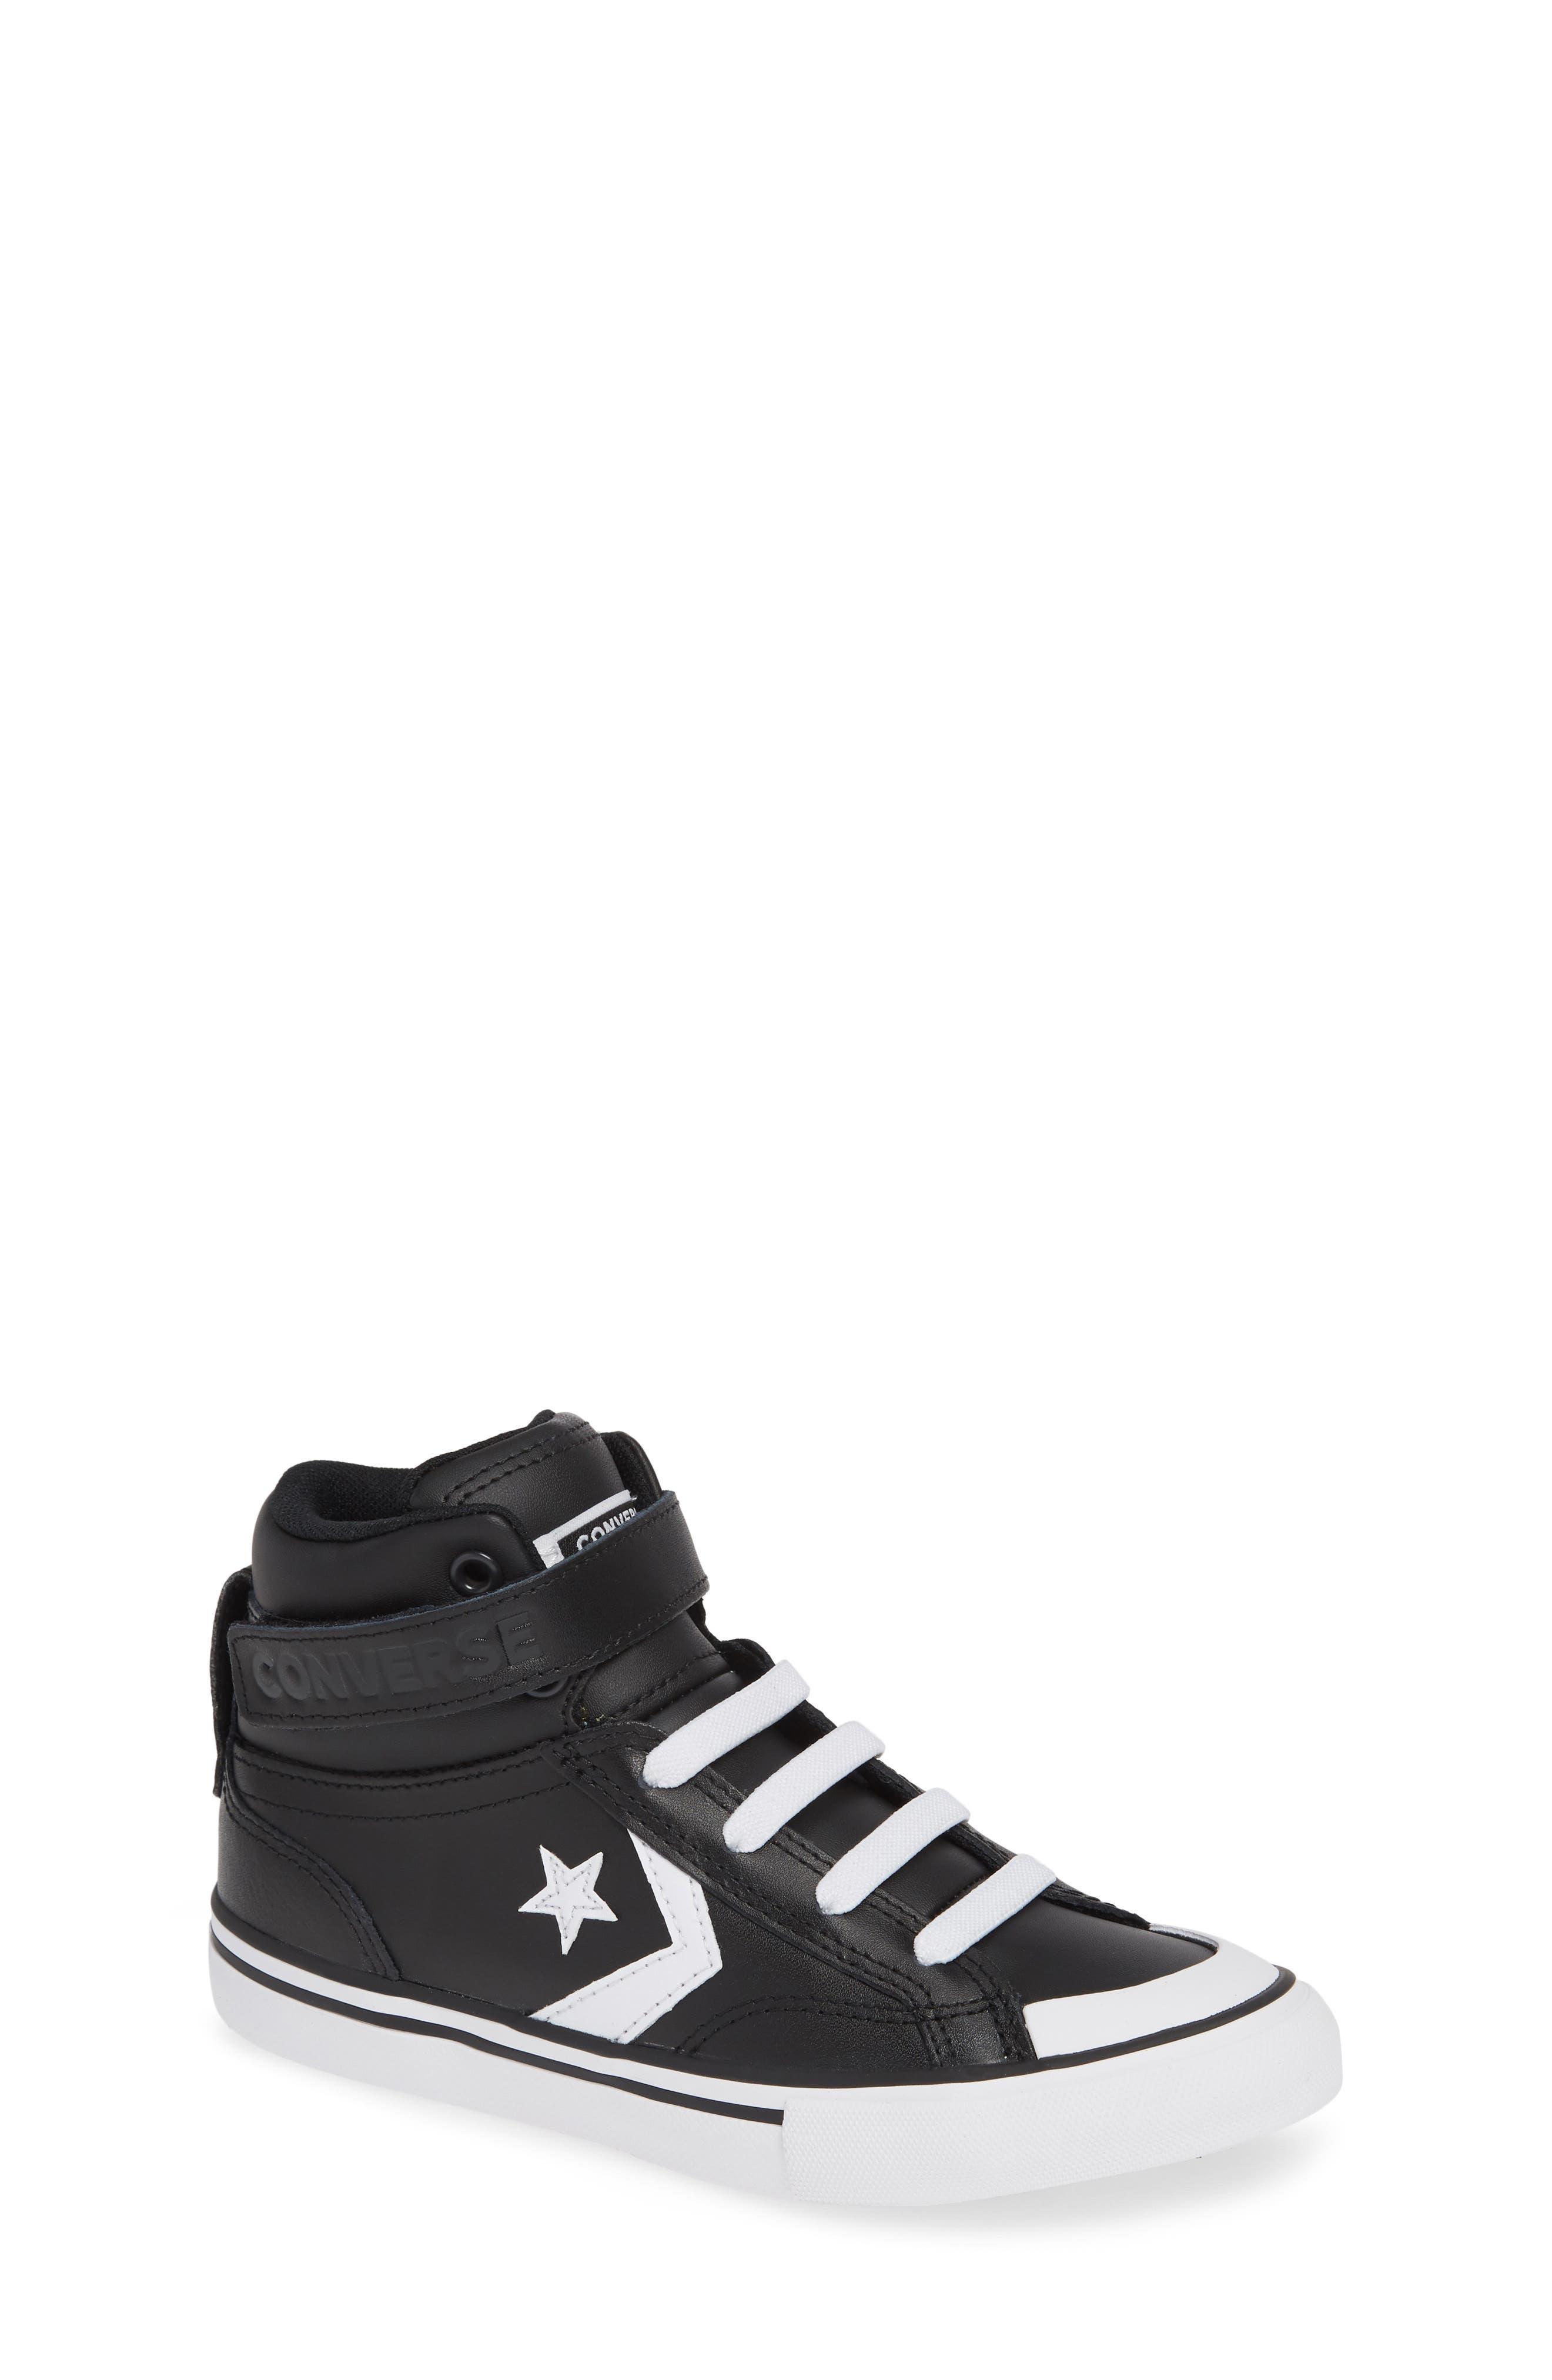 Converse | Pro Blaze High Top Sneaker